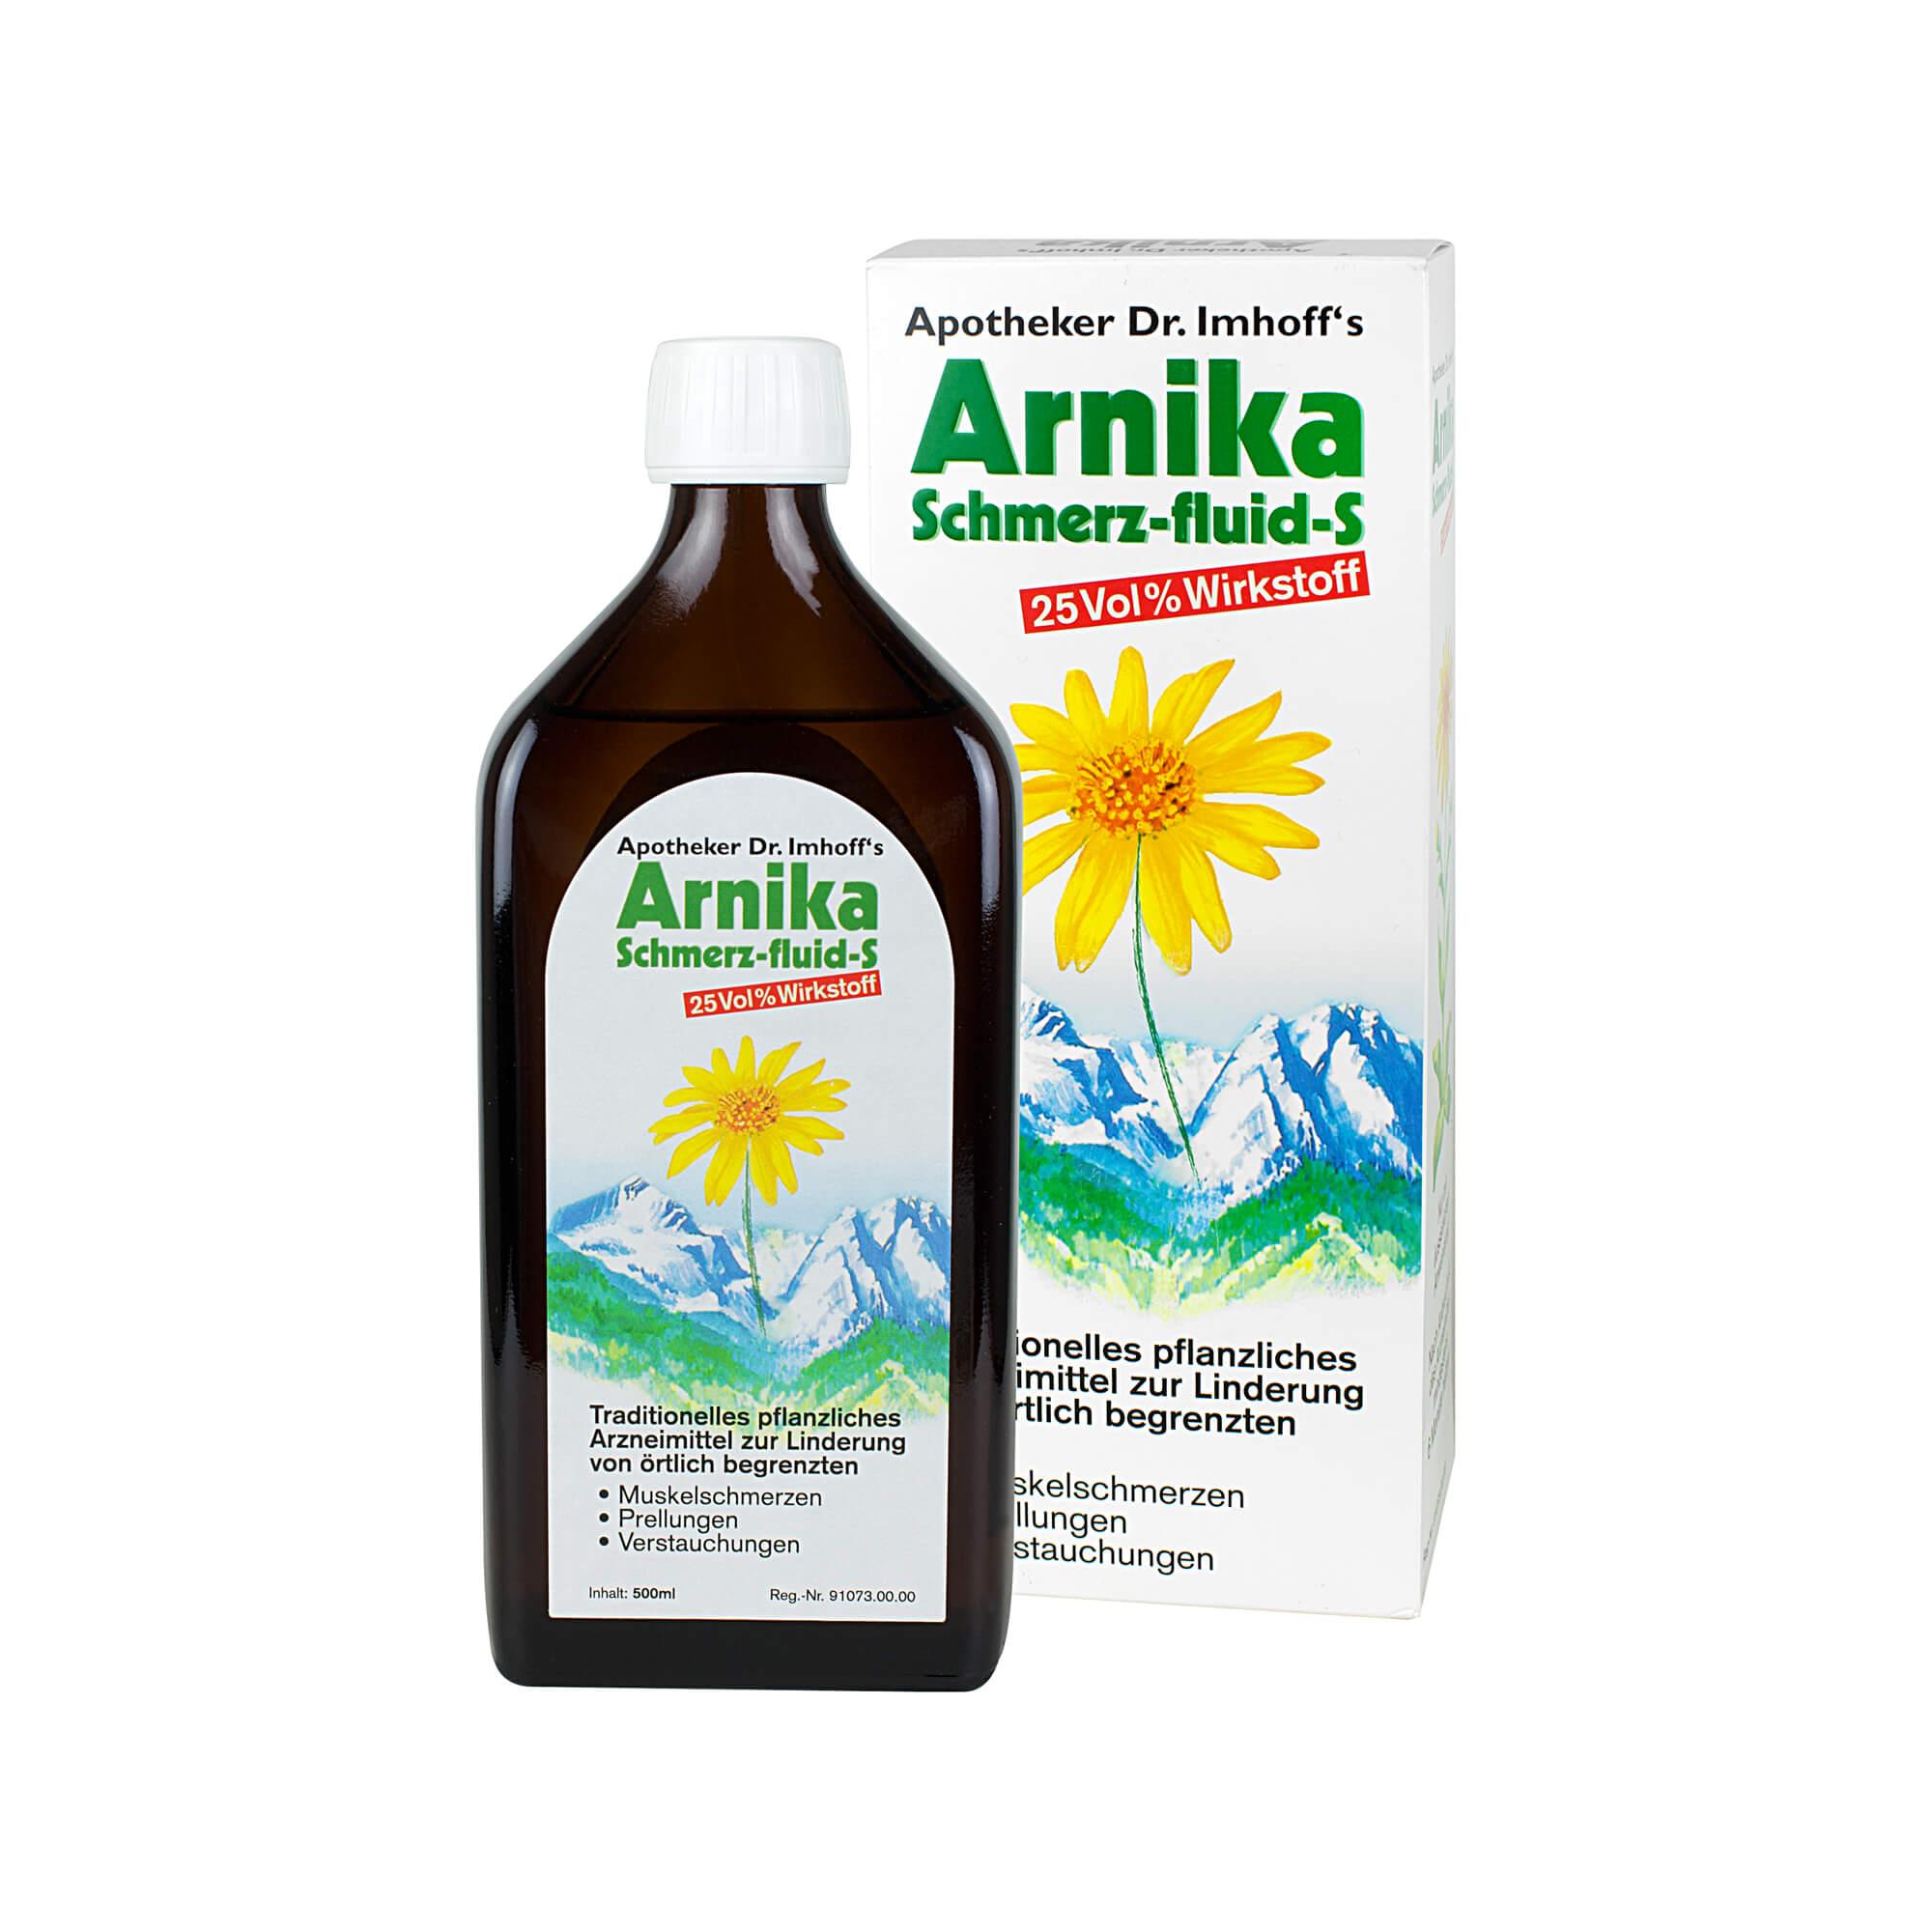 Apotheker Dr. Imhoff's Arnika Schmerz-fluid S